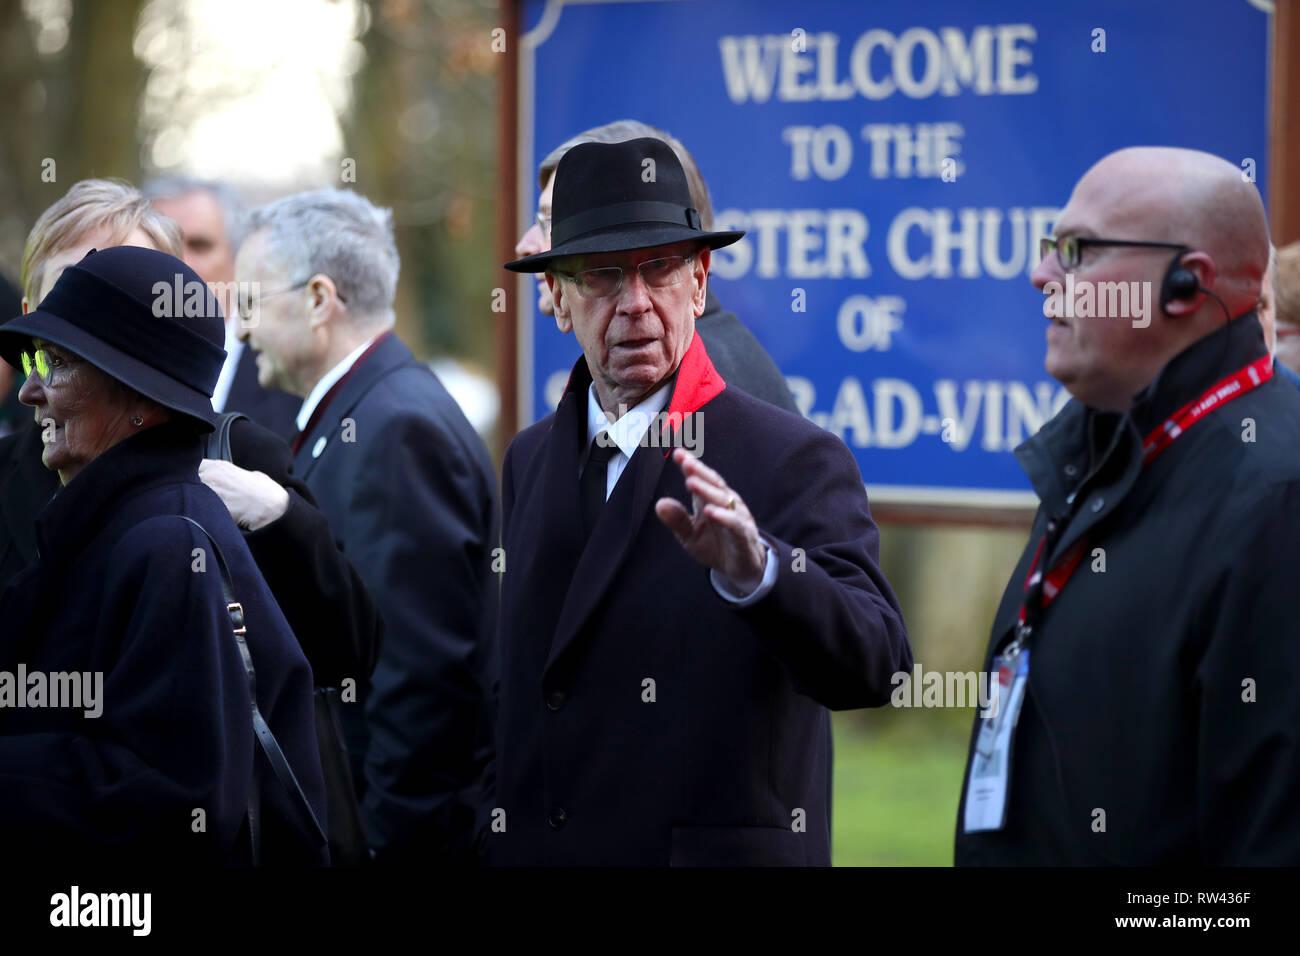 Sir Bobby Charlton (centre) during the funeral service for Gordon Banks at Stoke Minster. - Stock Image